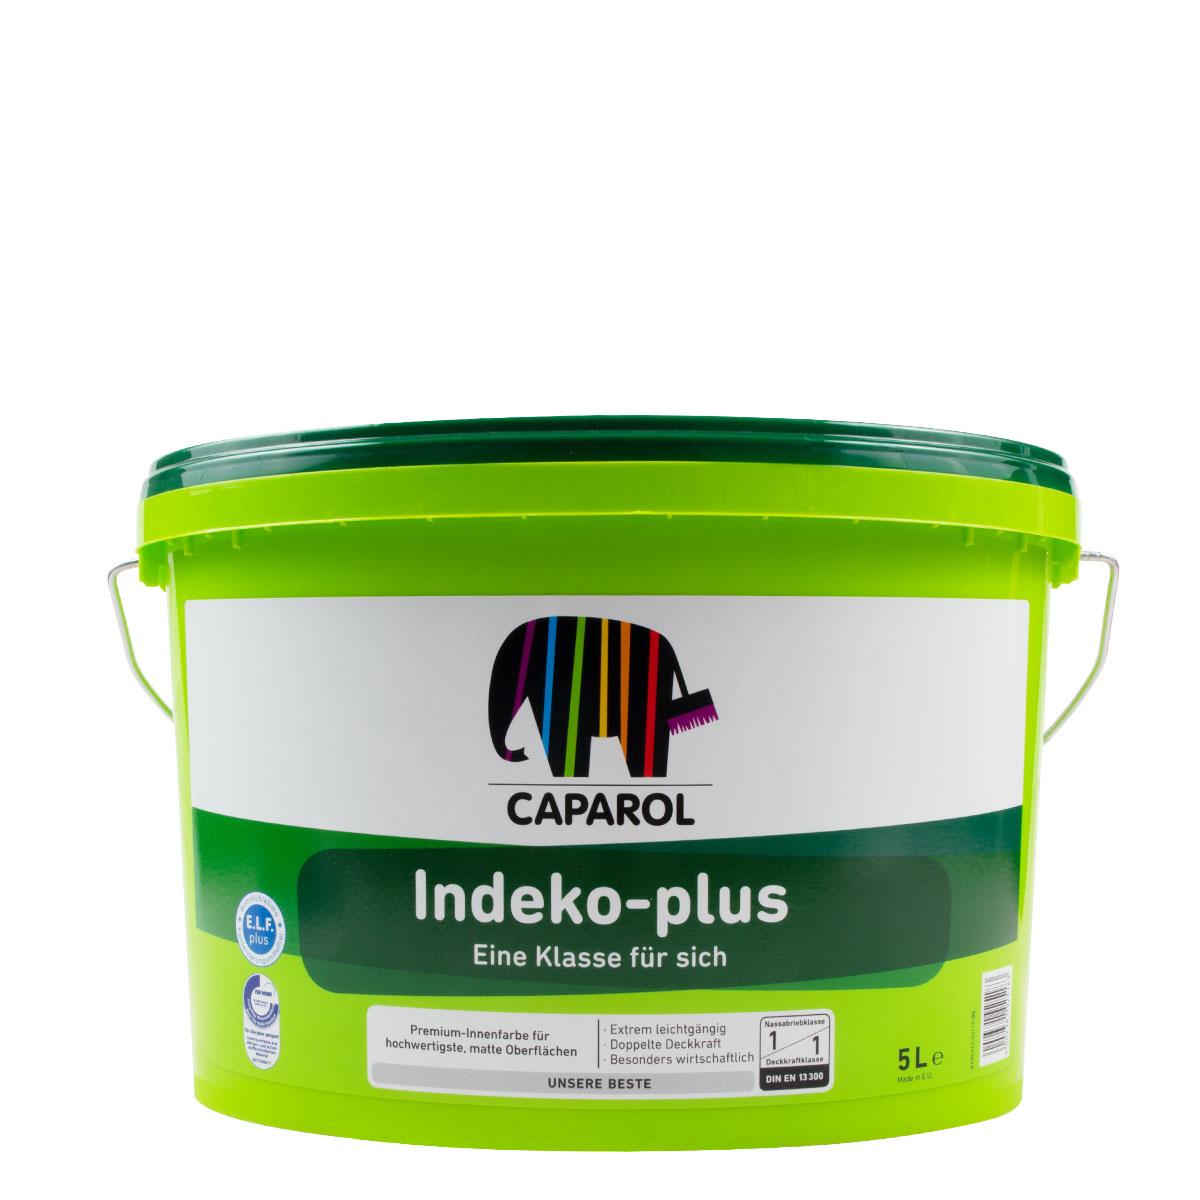 Caparol Indeko Plus MIX , premium Innenfarbe, hochdeckend